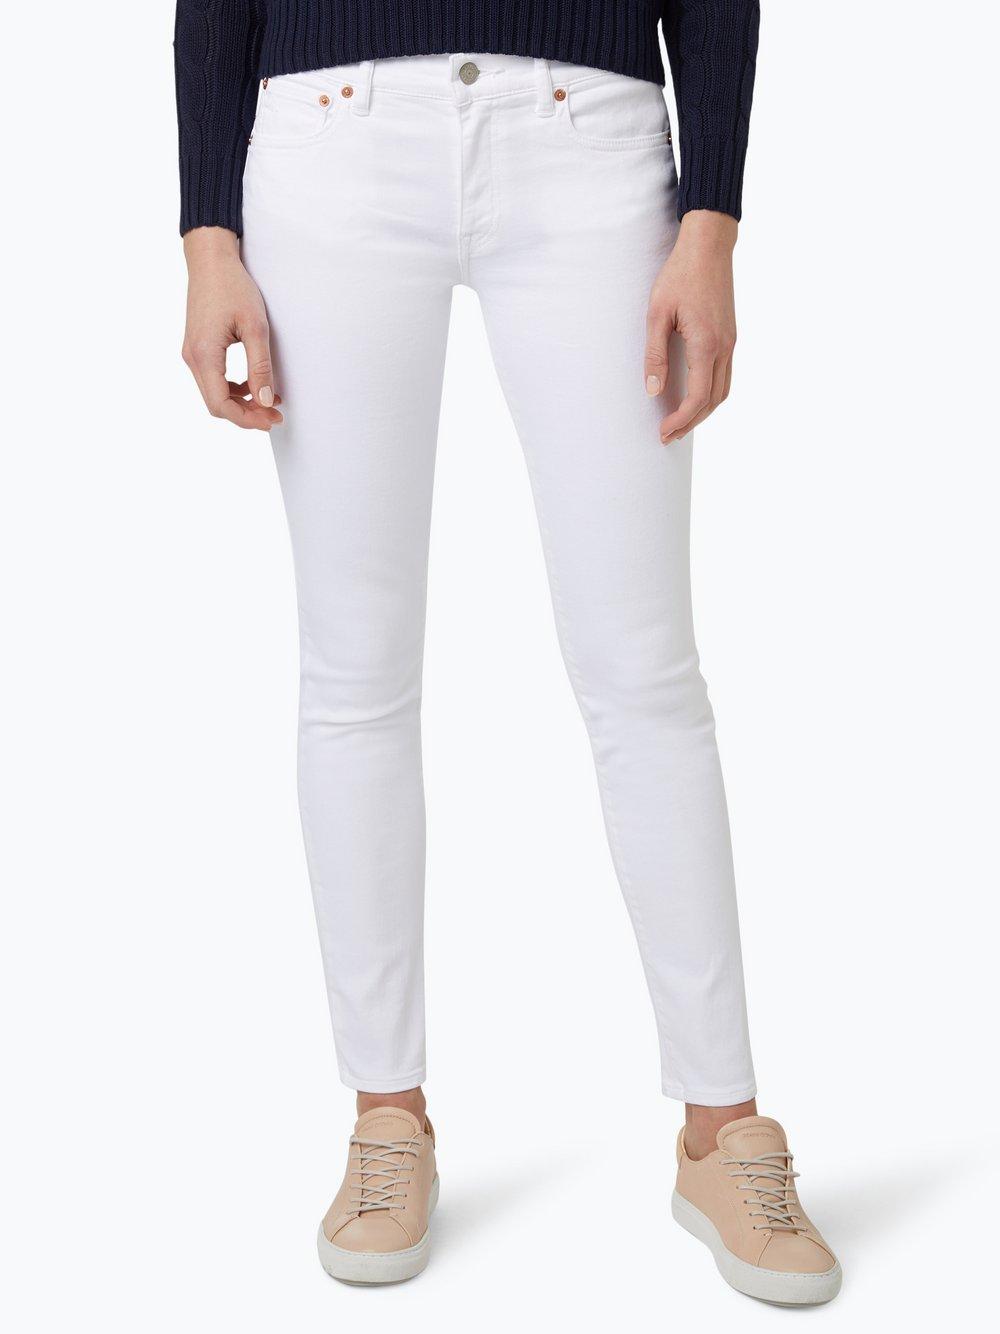 KaufenPeek Jeans Polo Online Lauren Ralph Damen Tompkins Skinny NwOP8kn0XZ